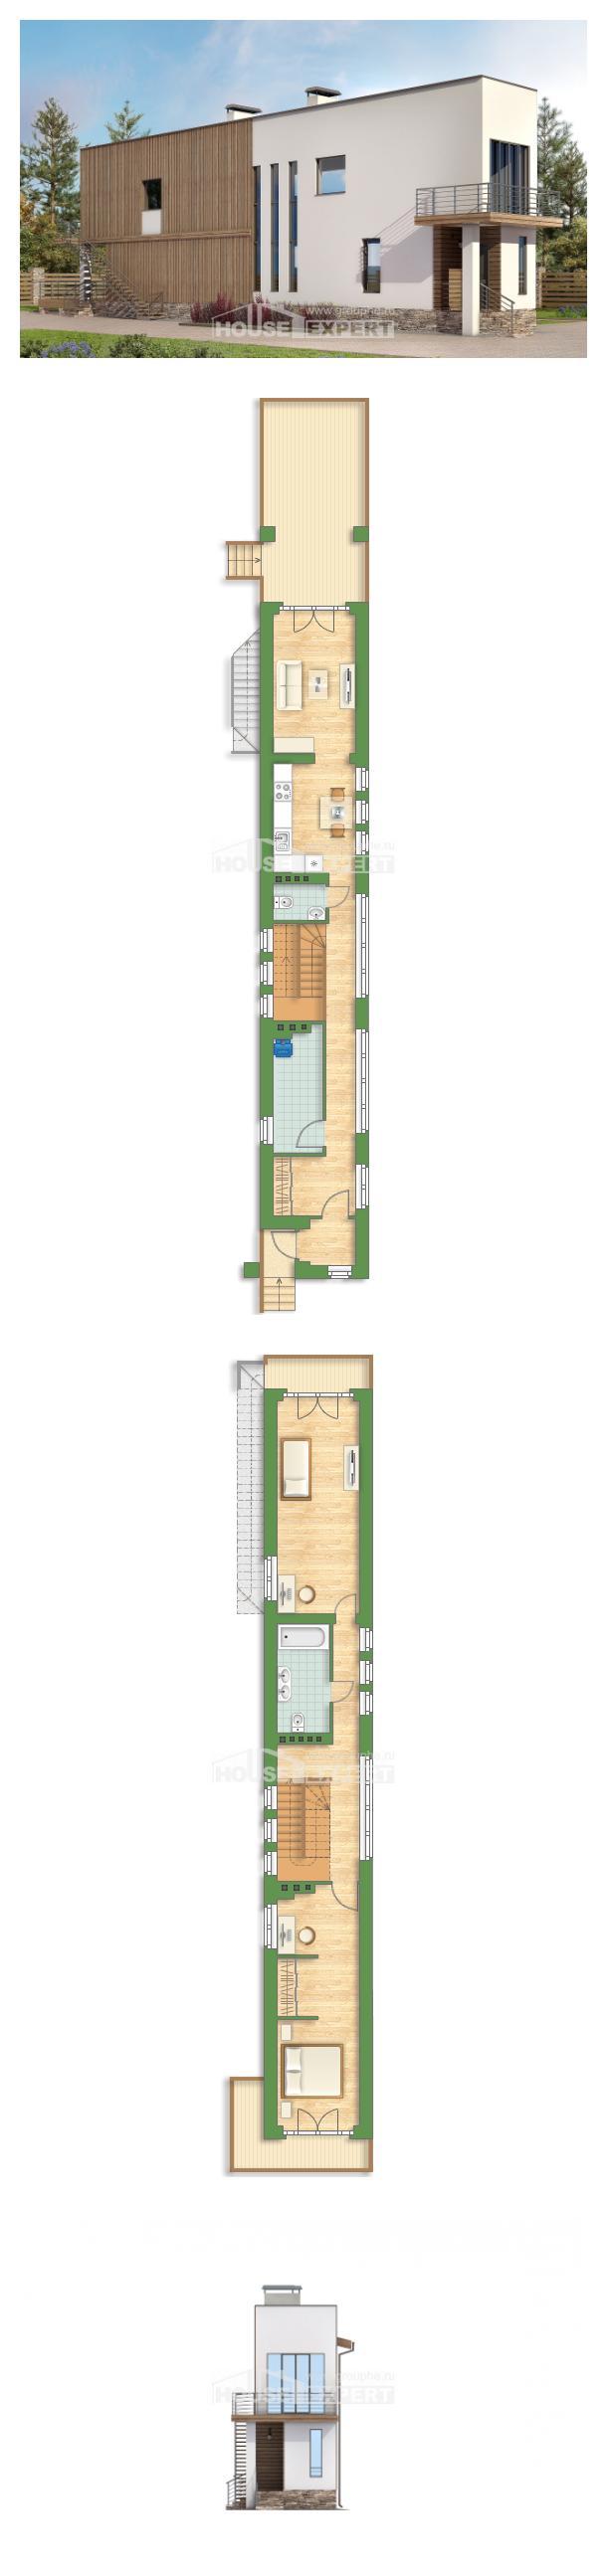 Проект дома 100-003-Л   House Expert